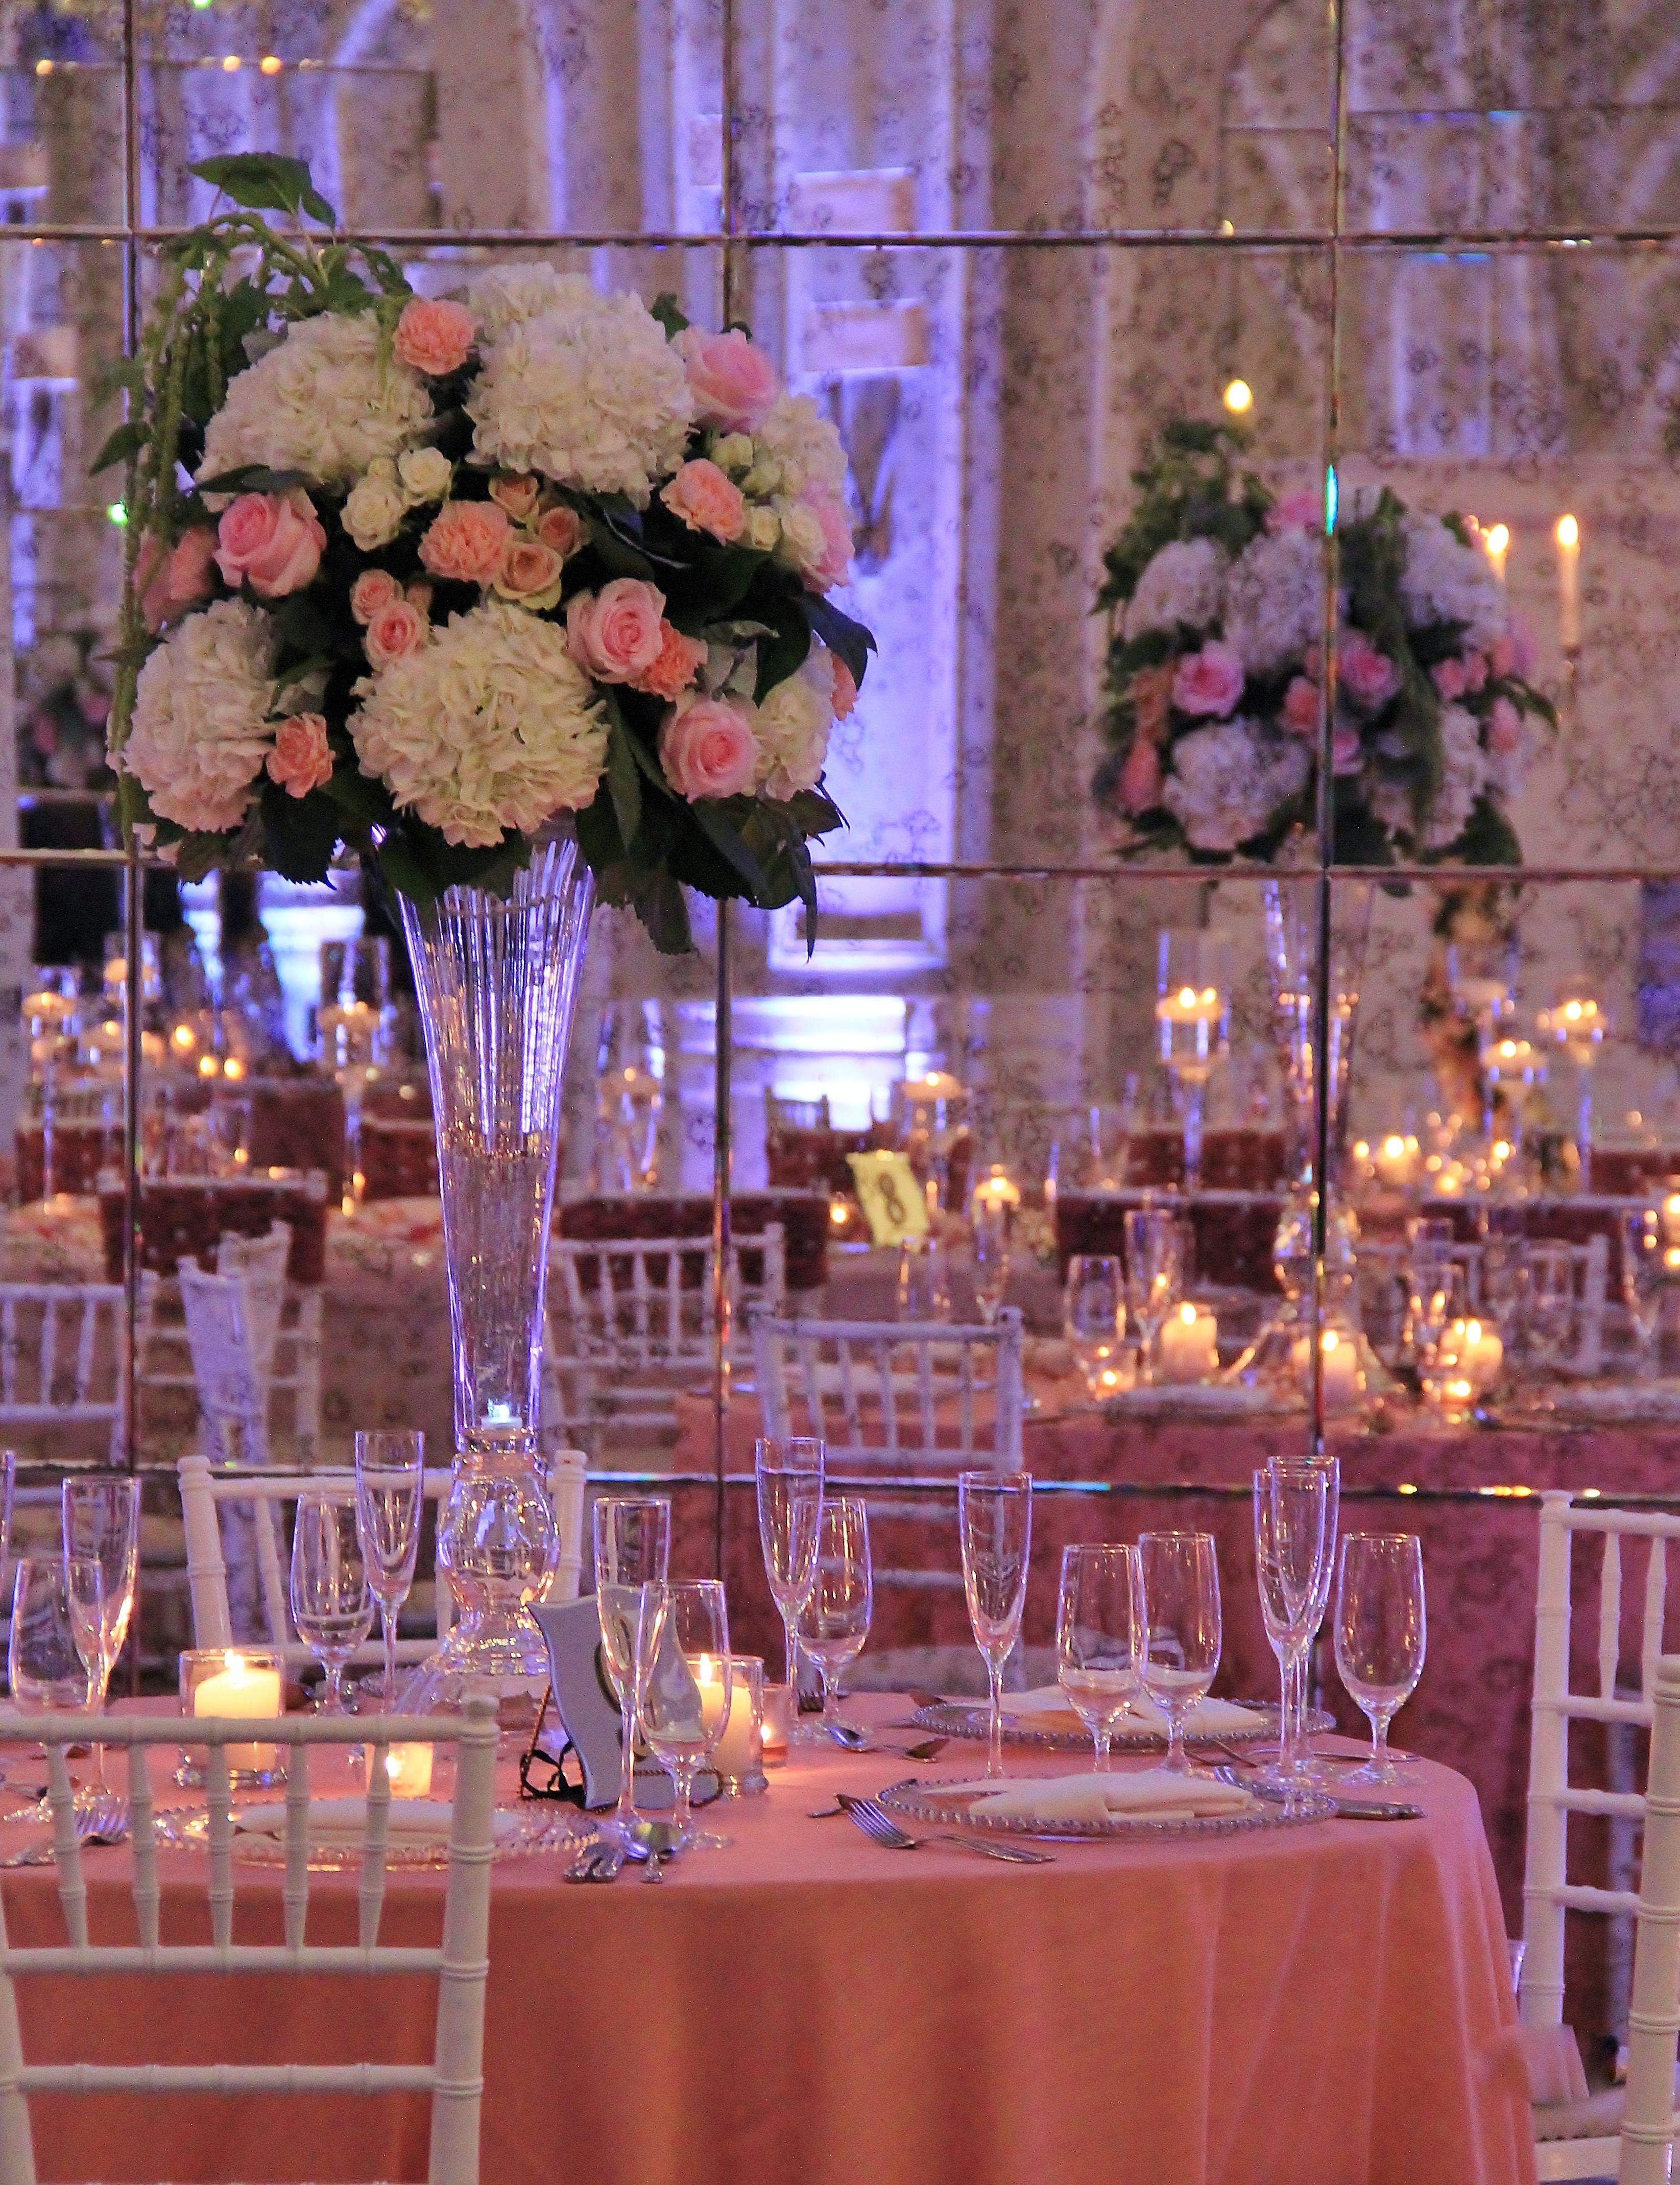 clear plastic vases in bulk of 15 beautiful rose gold vases bulk bogekompresorturkiye com throughout wedding floral centerpieces fresh trumpet vases filled at the crystal ballroom with hydra